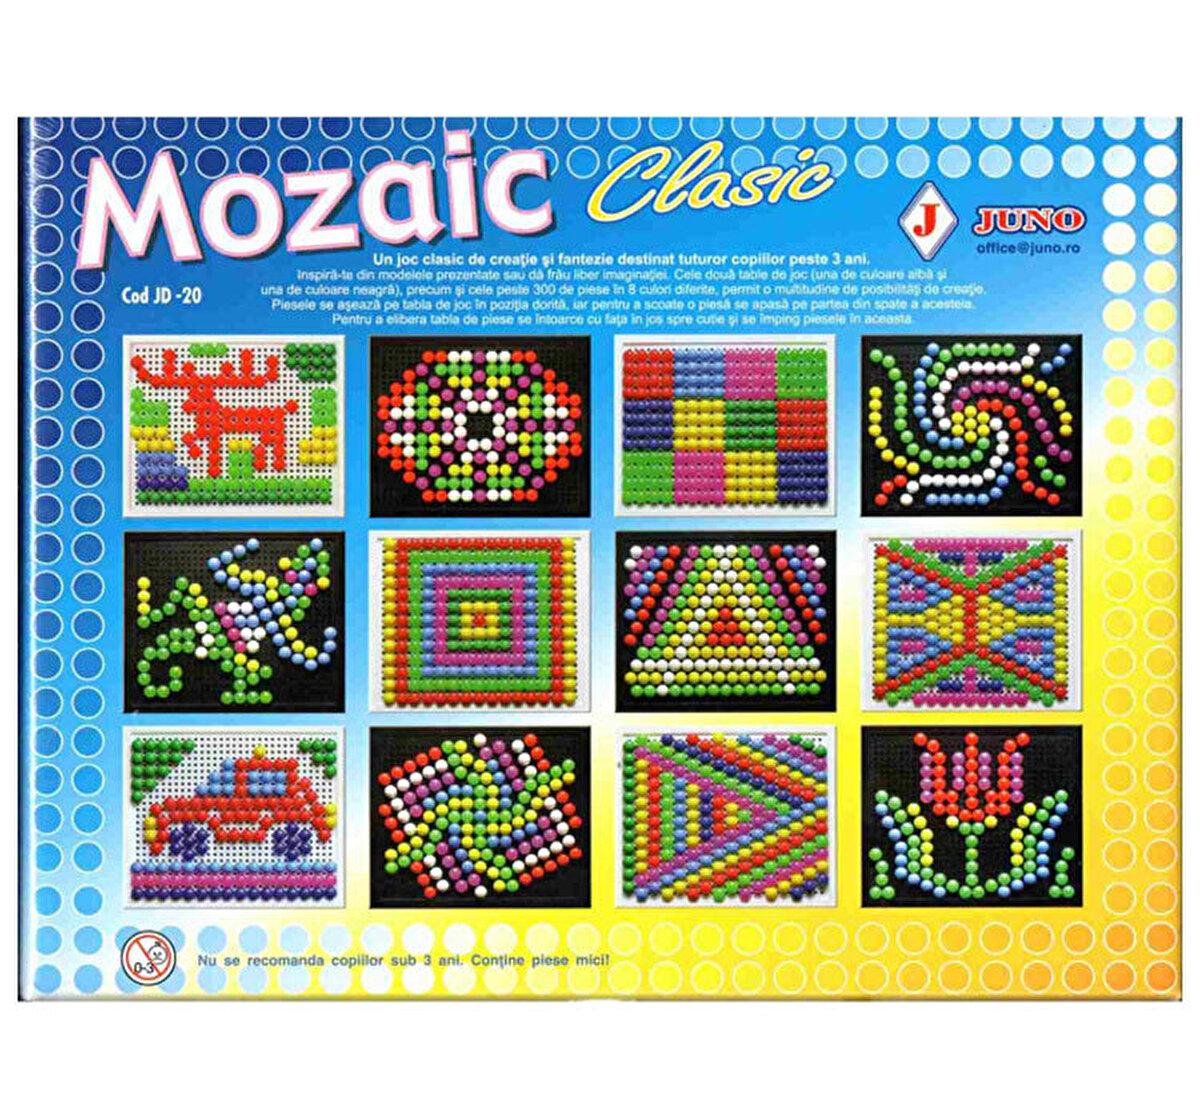 Set Mozaic clasic